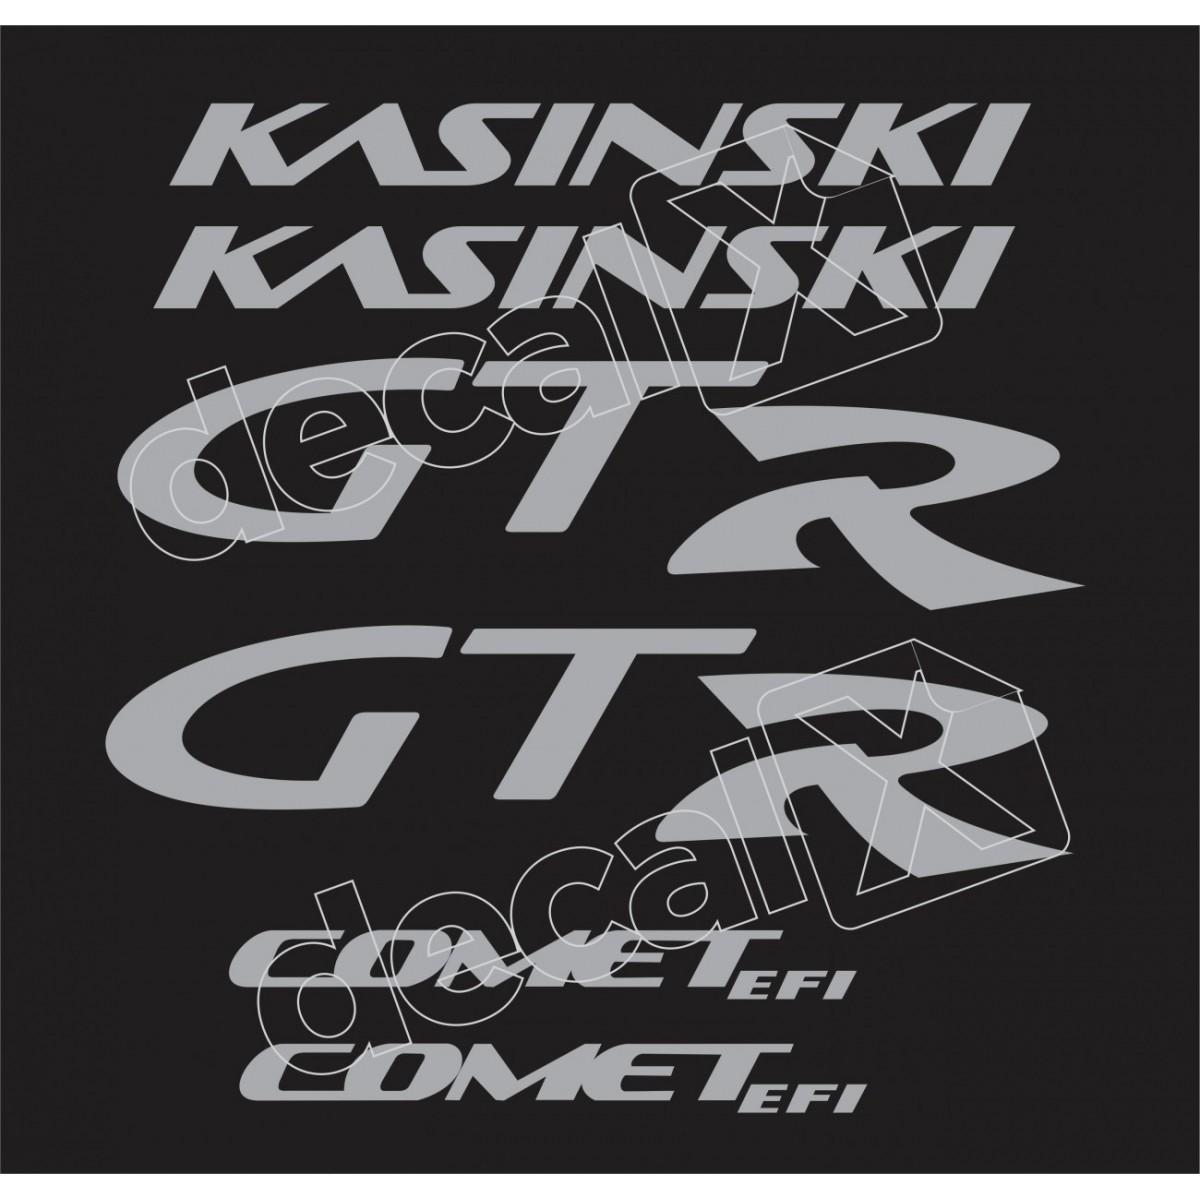 Kit Adesivos Kasinski Comet 250 Gtr Em Prata 01